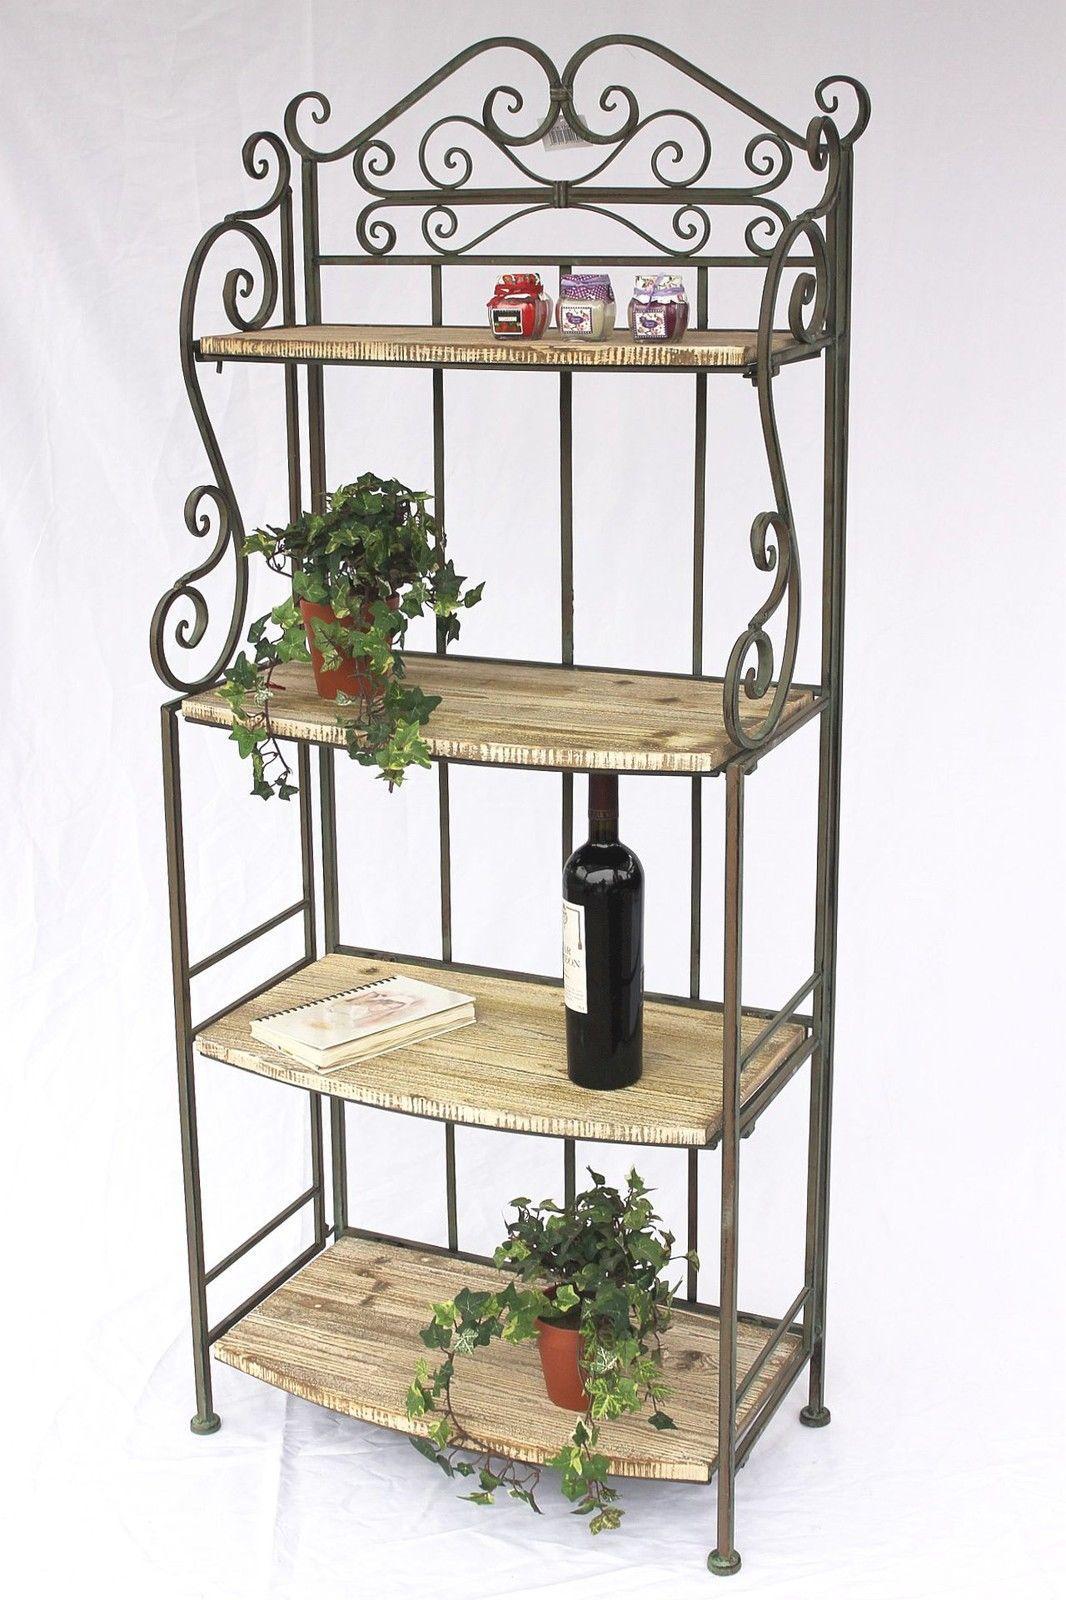 regal malega 12060 aus metall und holz 150 cm. Black Bedroom Furniture Sets. Home Design Ideas